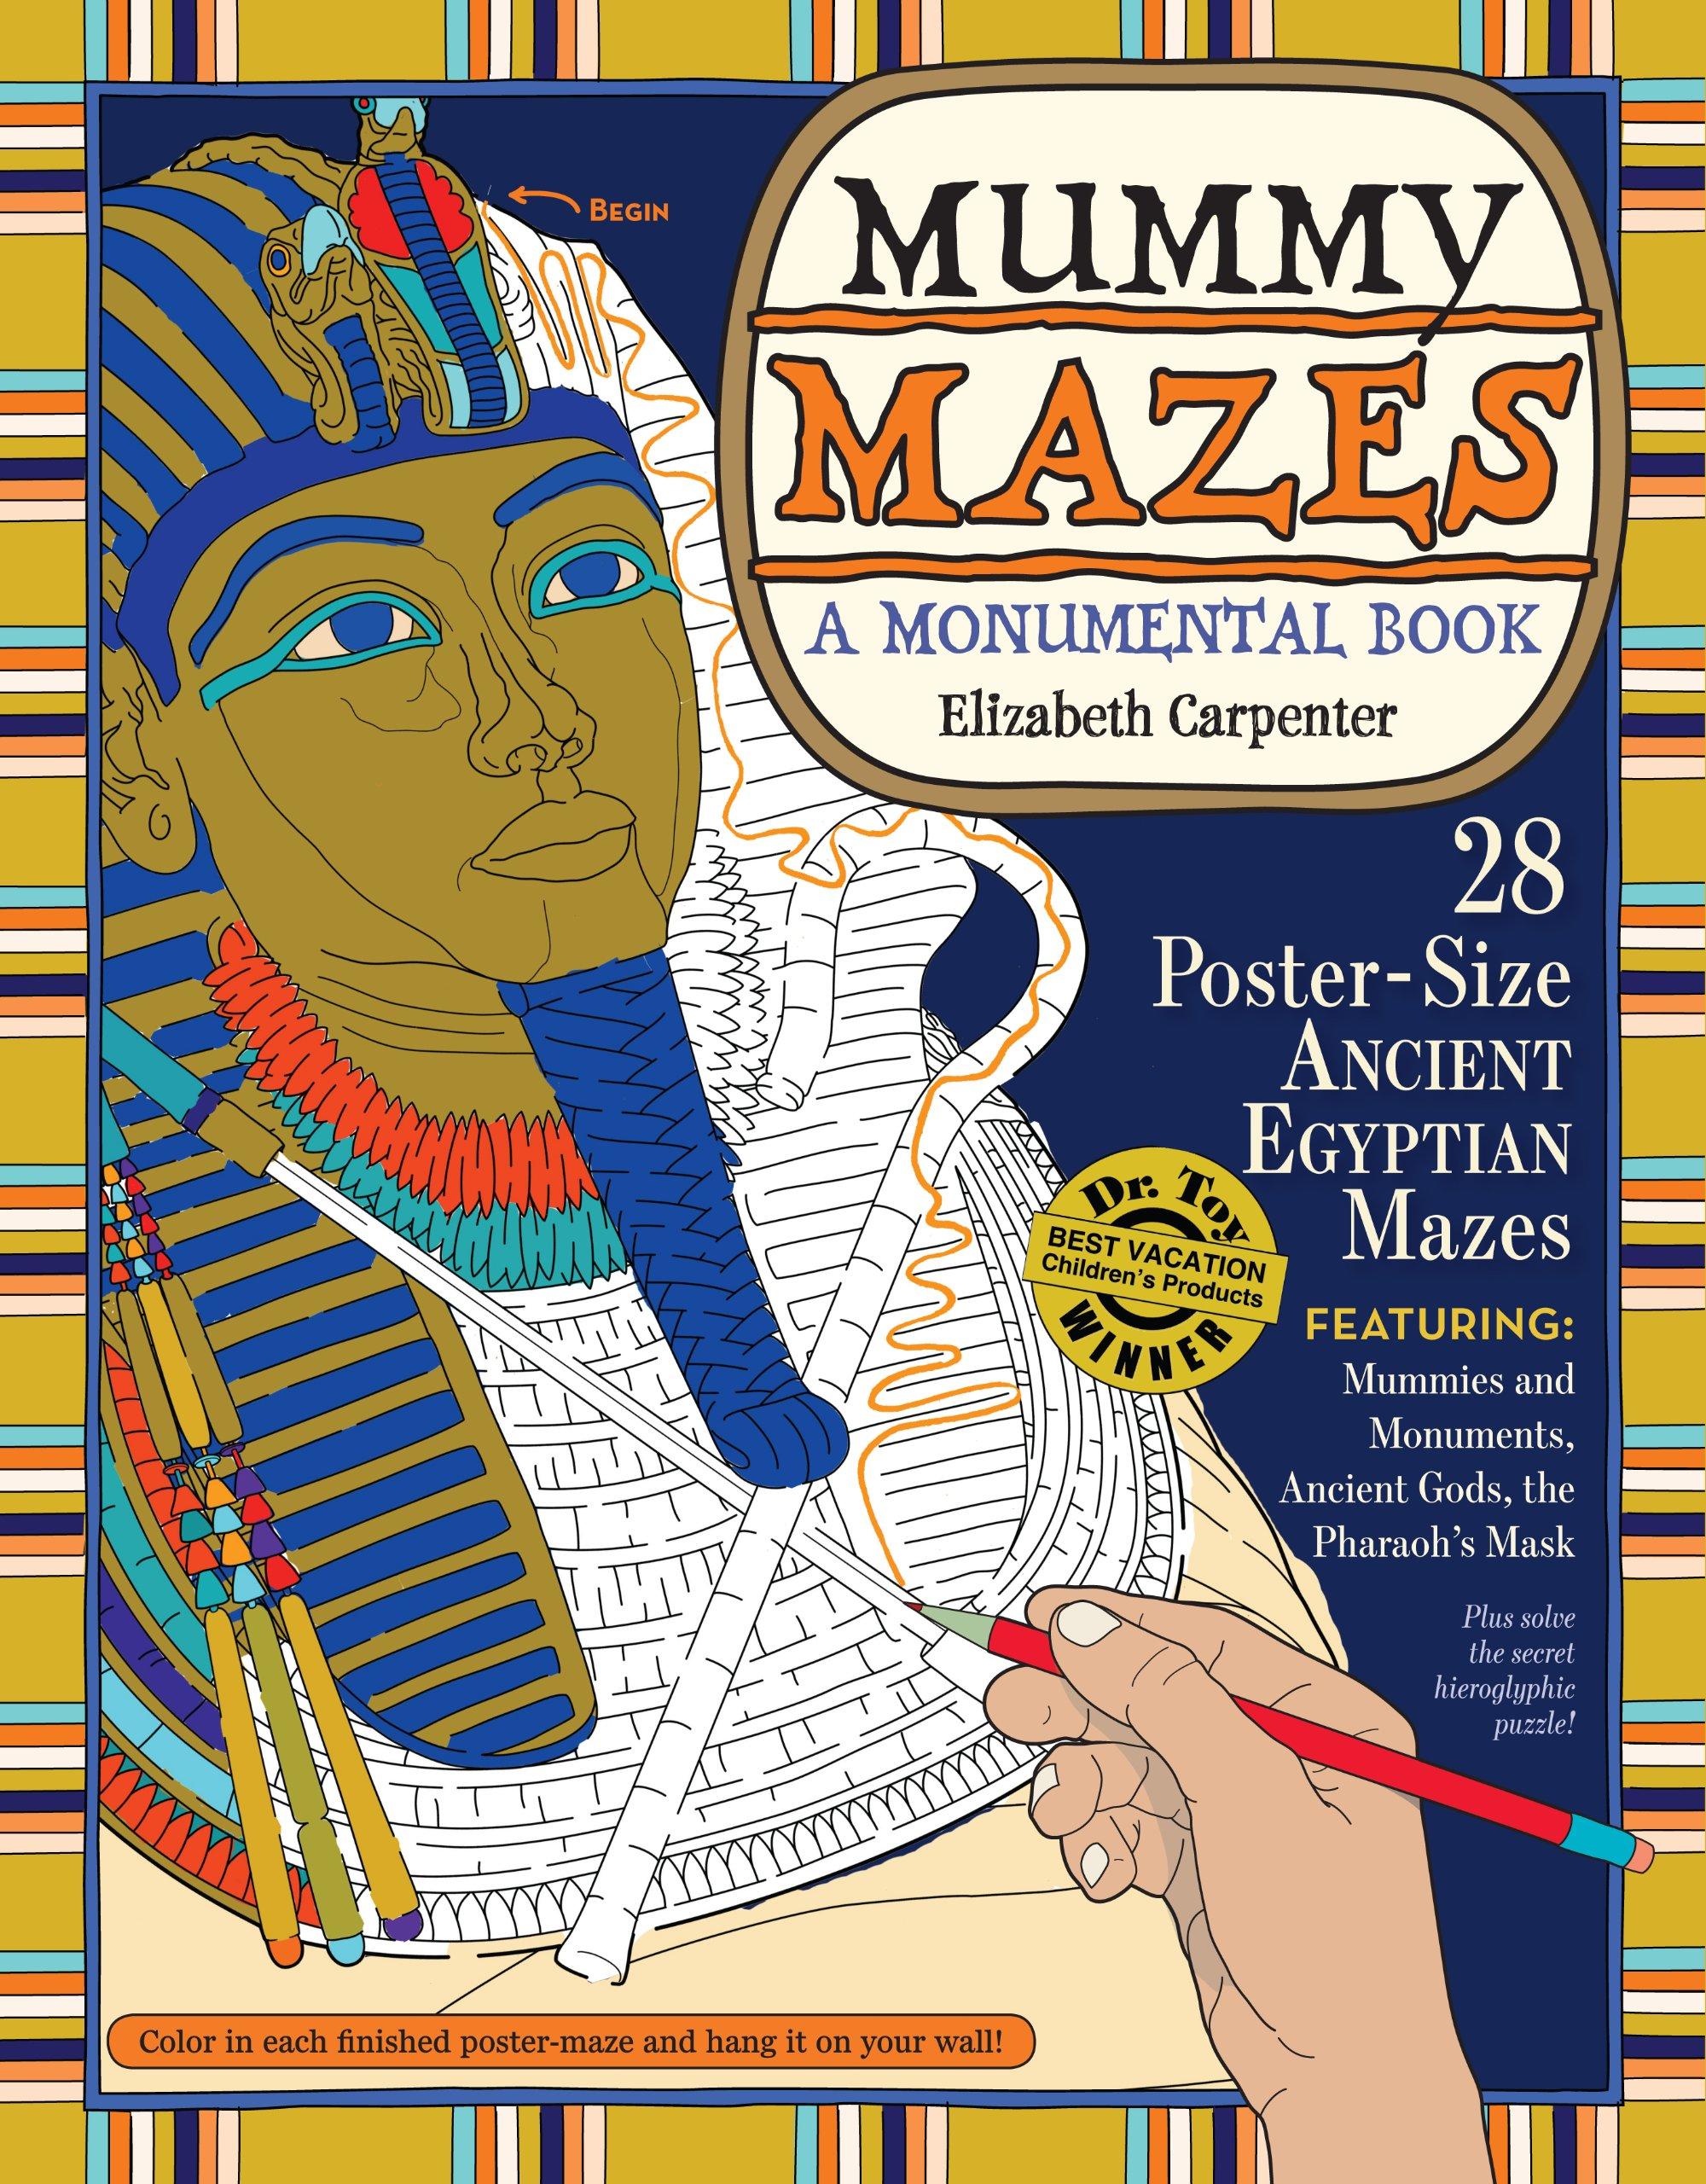 Mummy Mazes: A Monumental Book Paperback – November 4, 2010 Elizabeth Carpenter Workman Publishing Company 0761160744 JNF001000